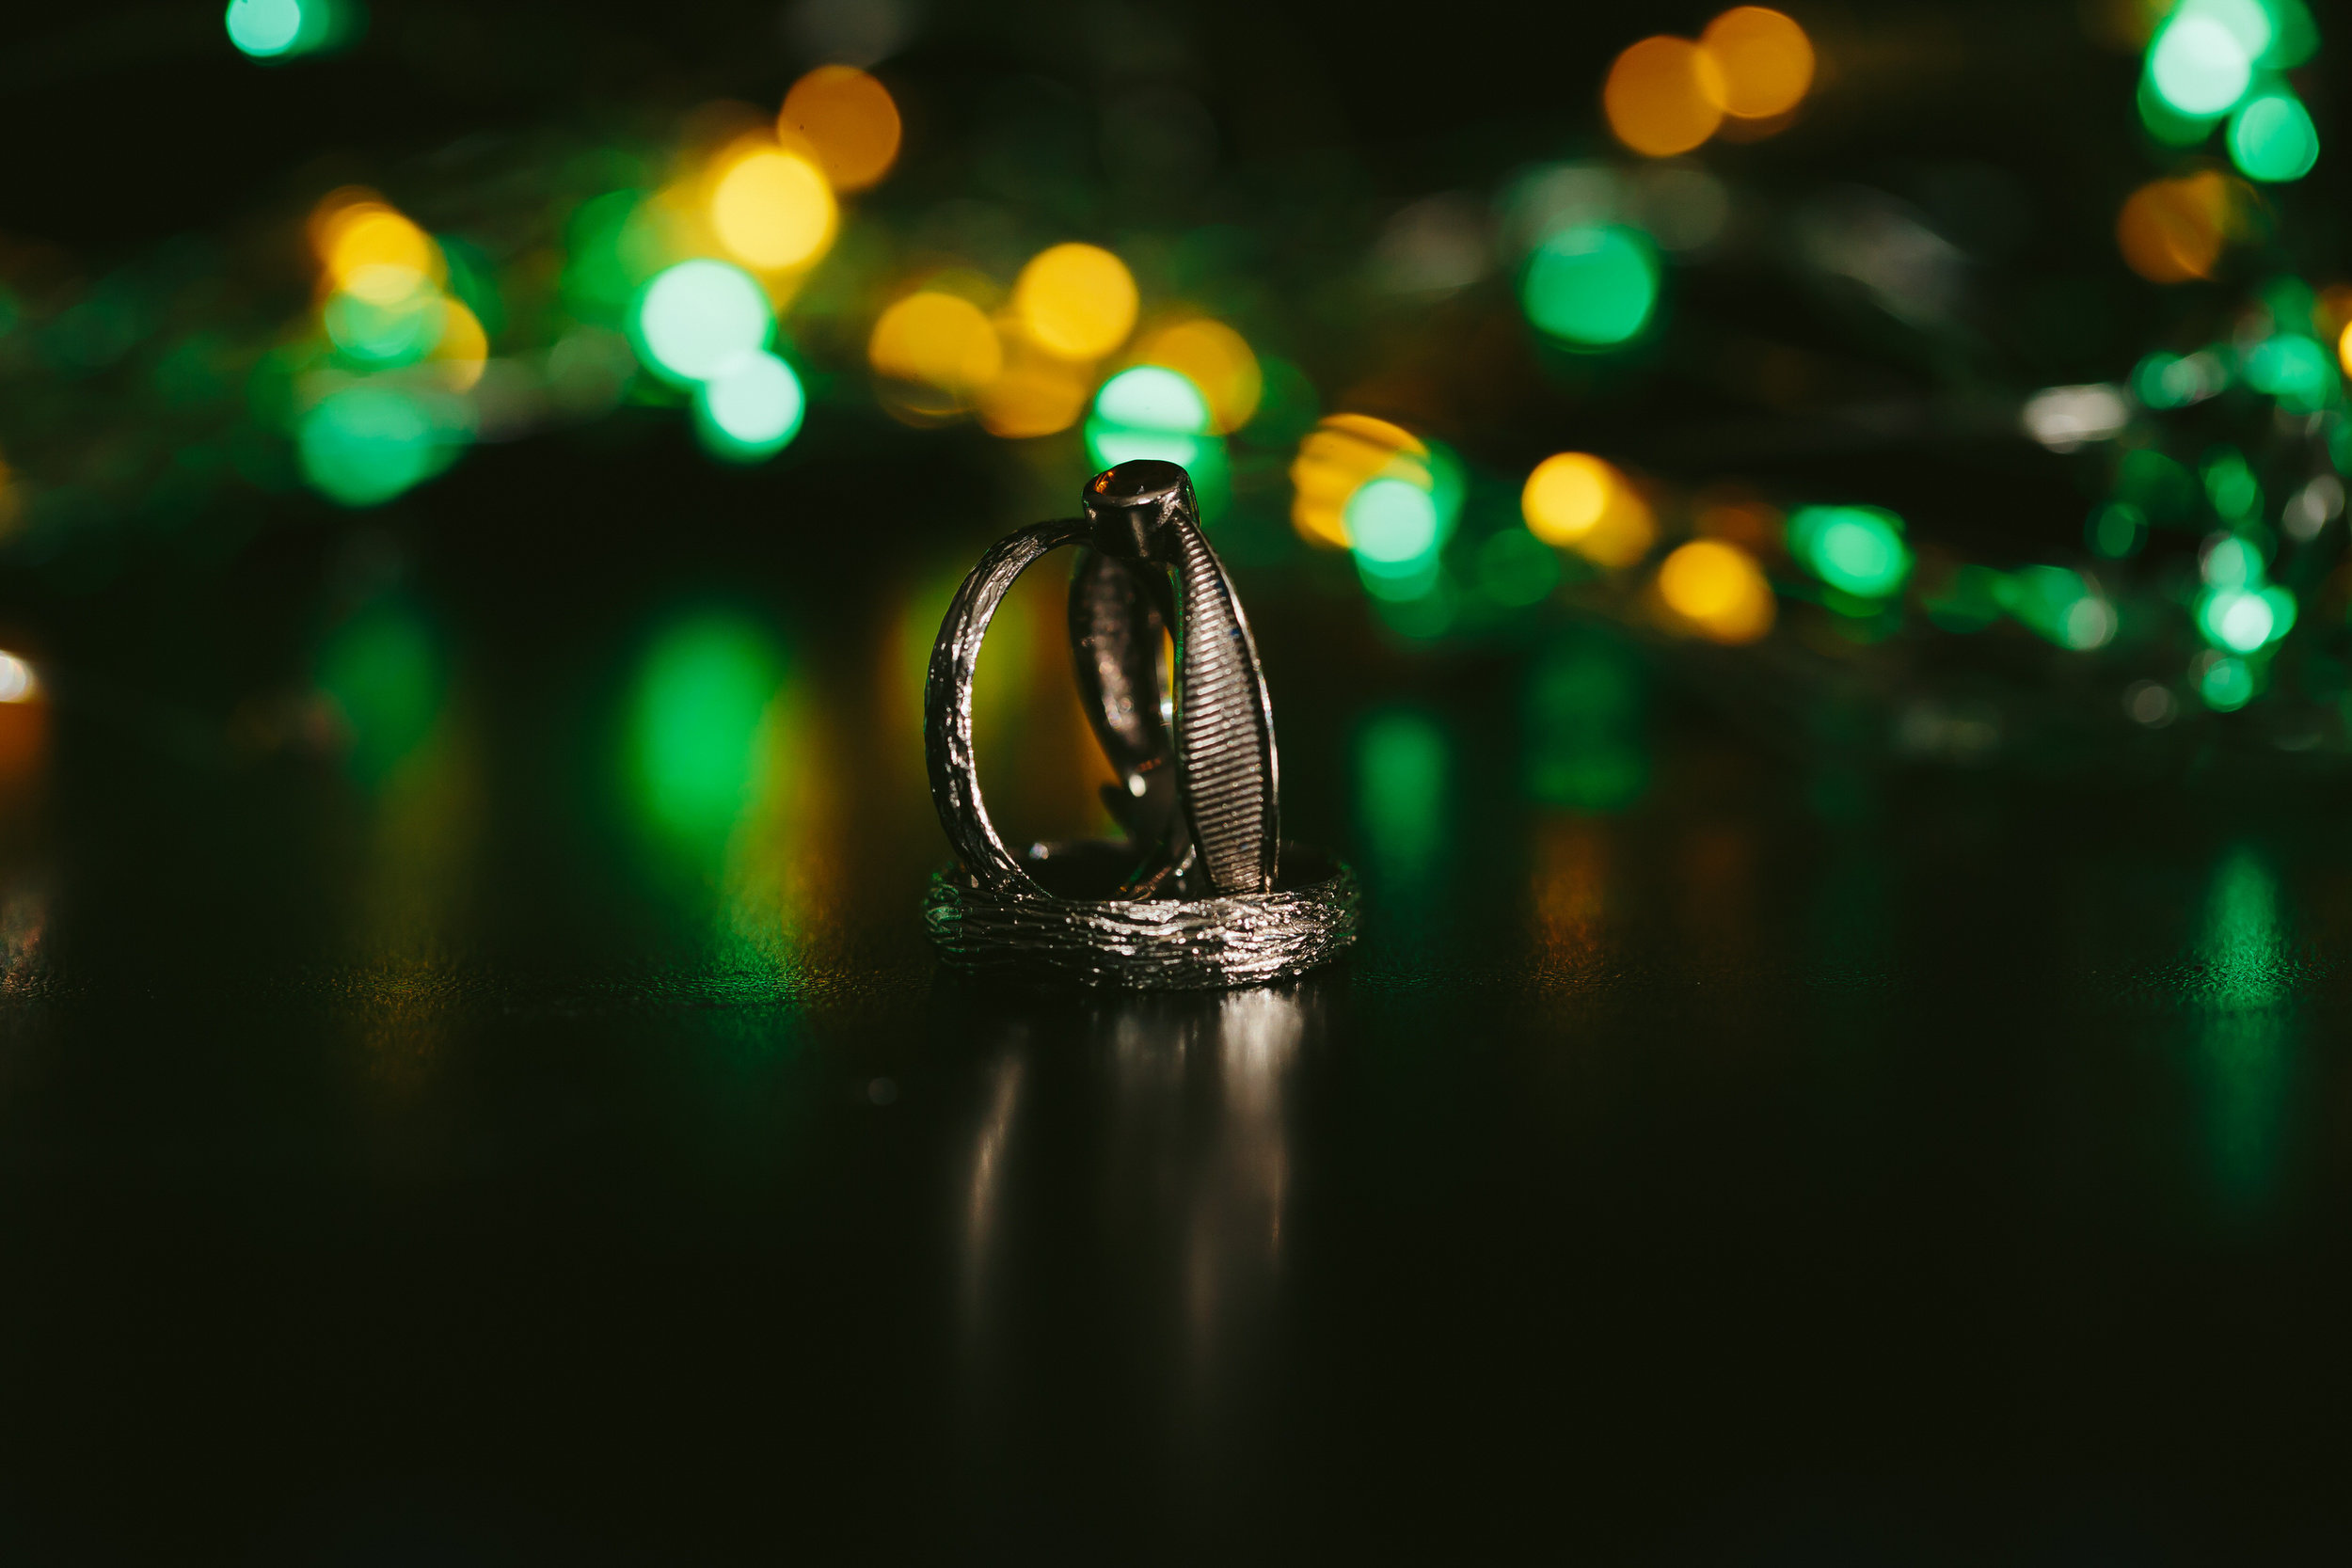 wedding_rings_magmod_photographer_tiny_house_photo.jpg